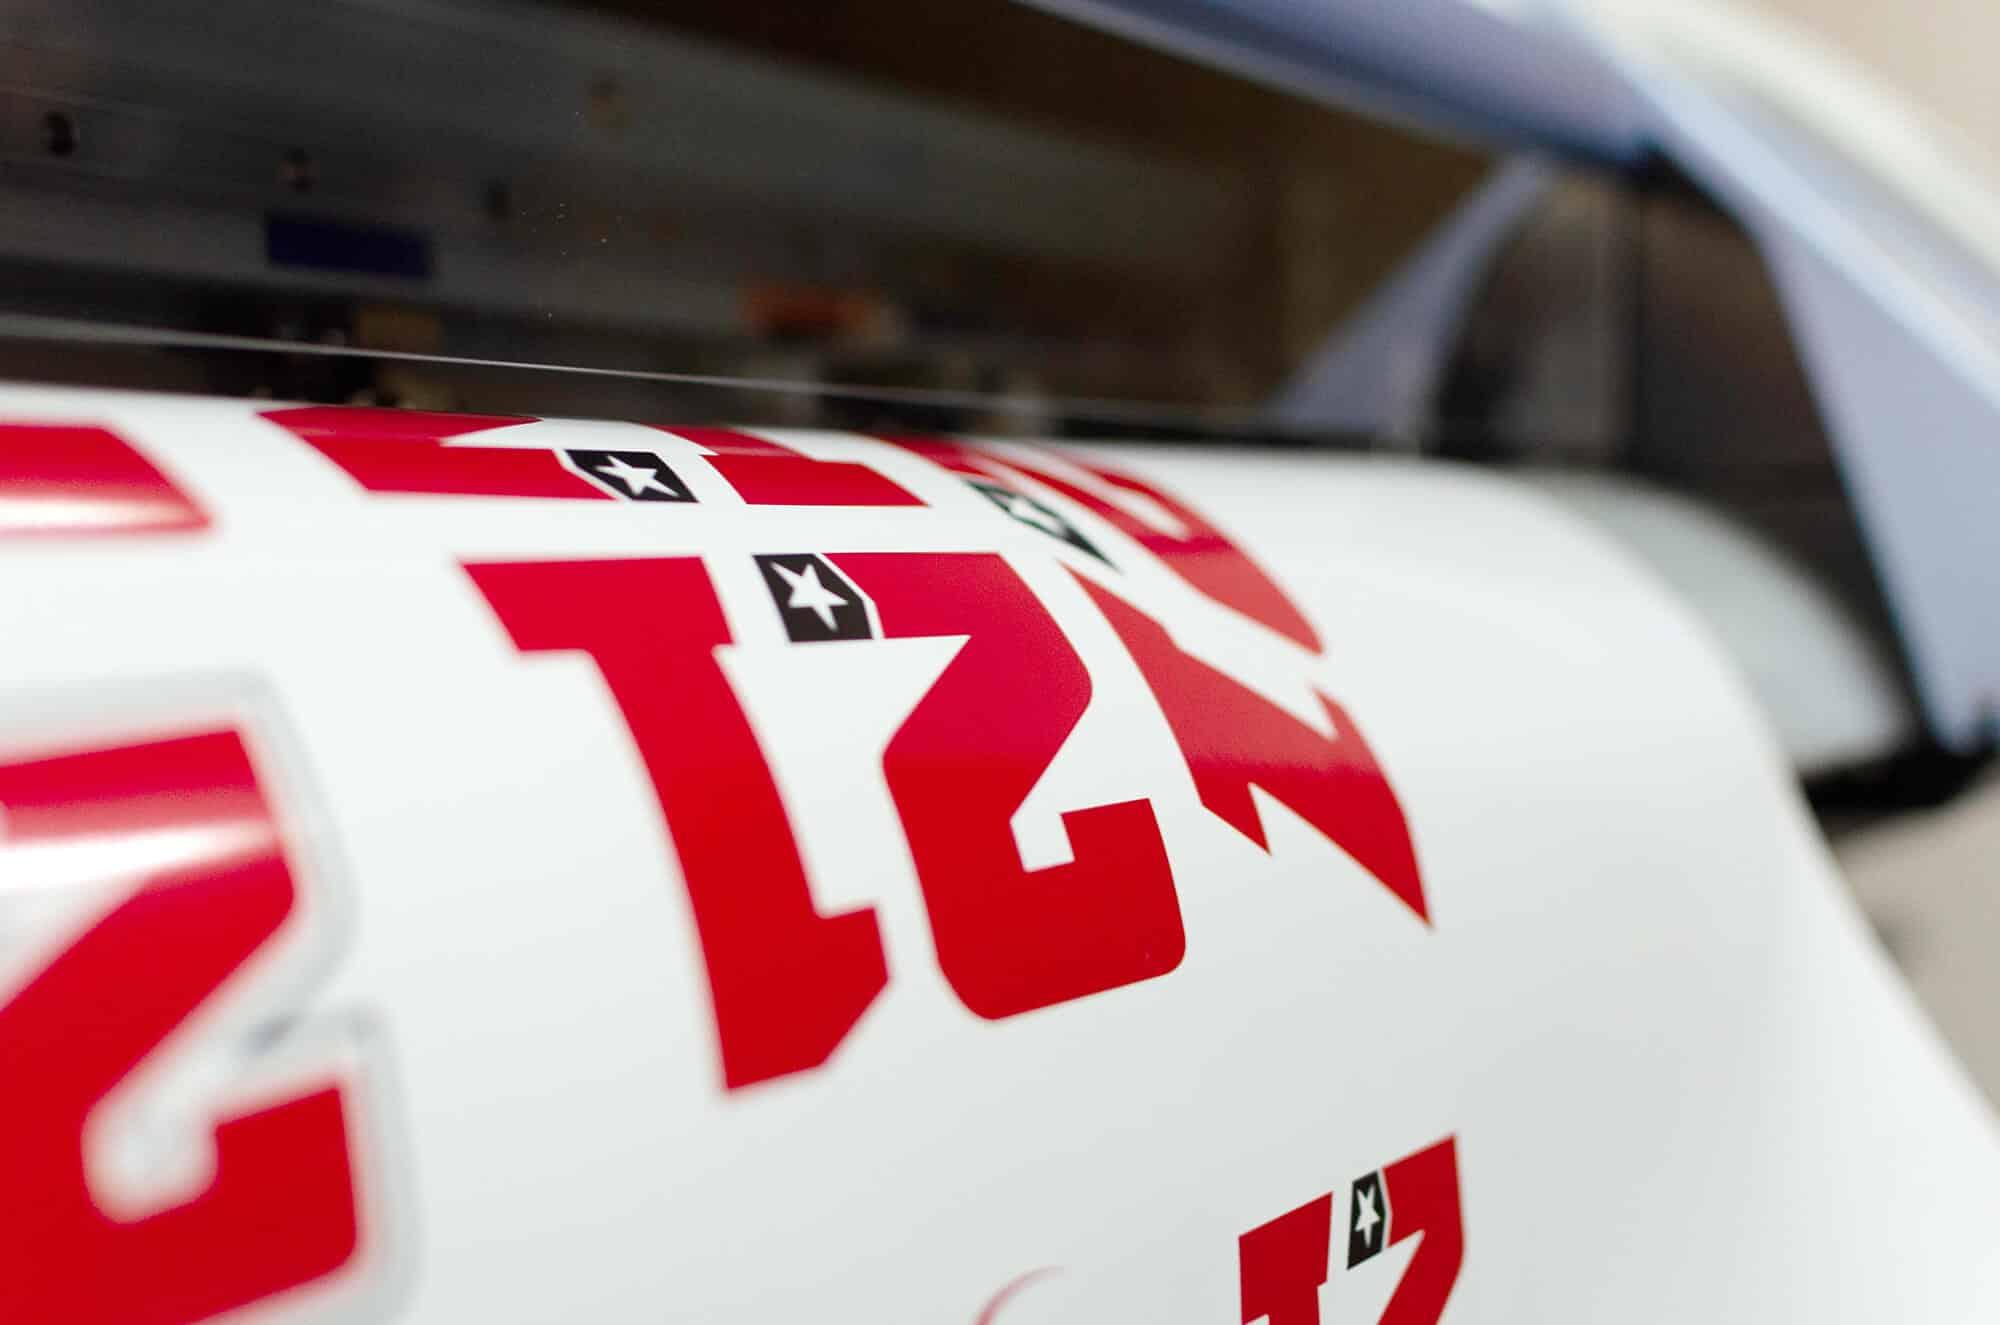 armada-racing-preparateur-echappement-inox-limoges-nouvelle-aquitaine_05